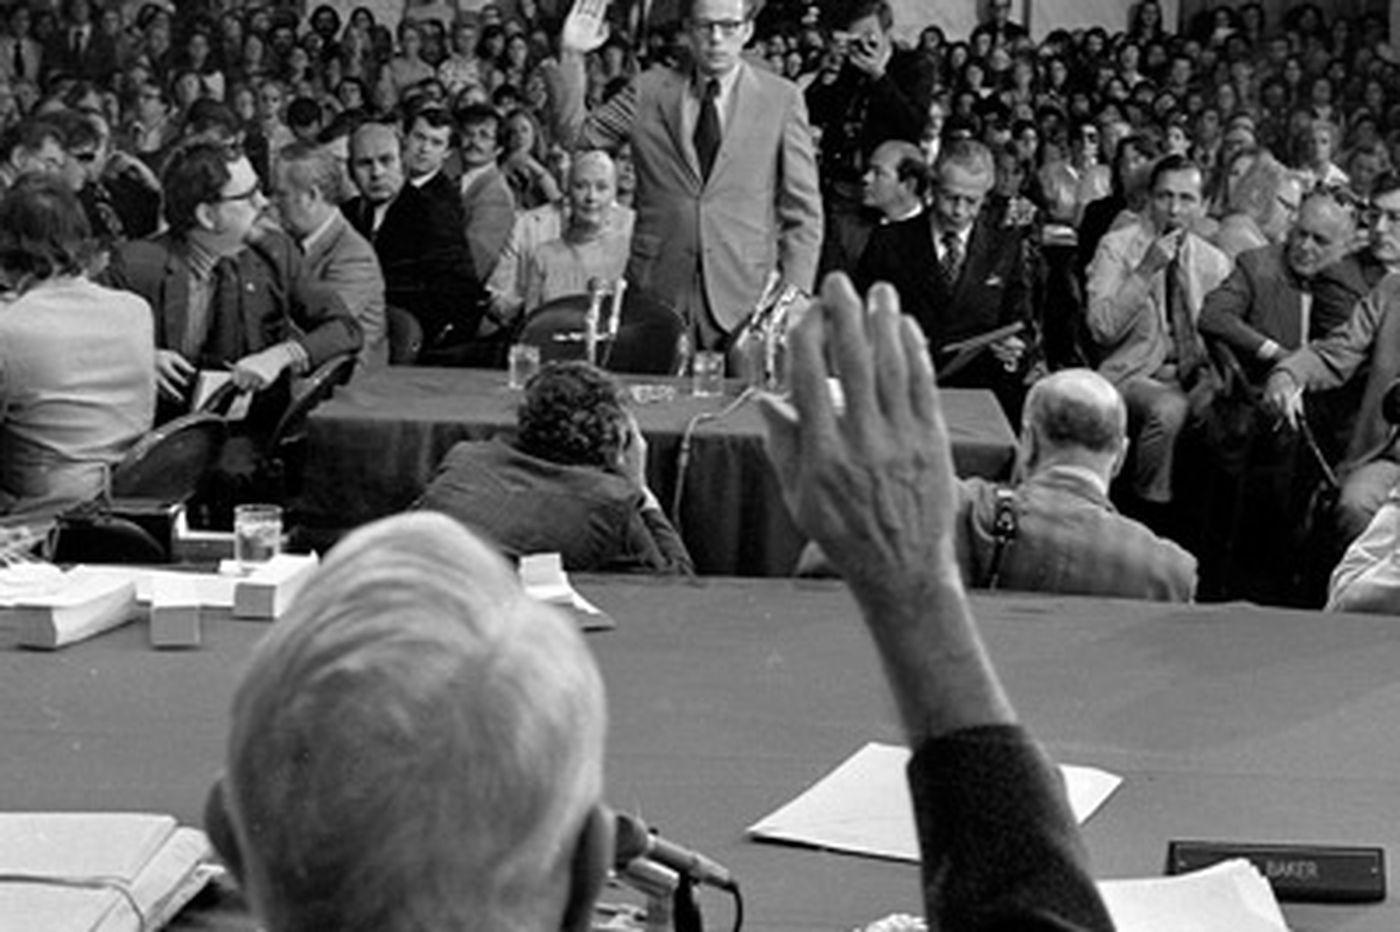 Watergate's John Dean still wonders how so many lawyers got involved